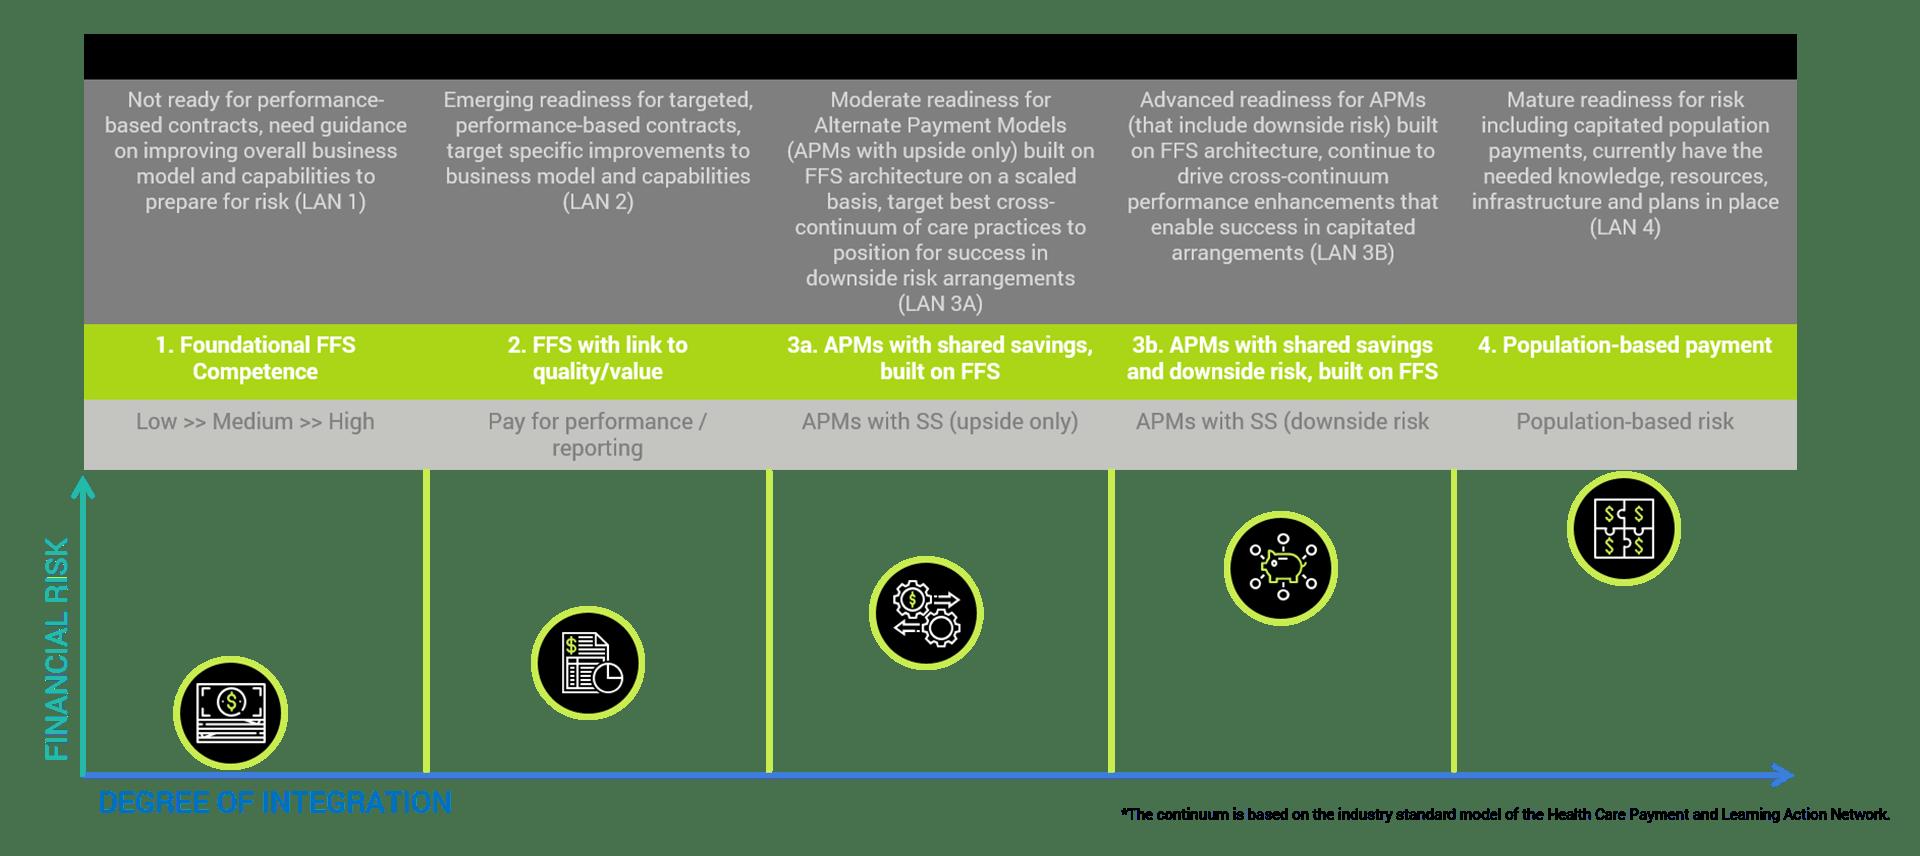 Value-based readiness scoring